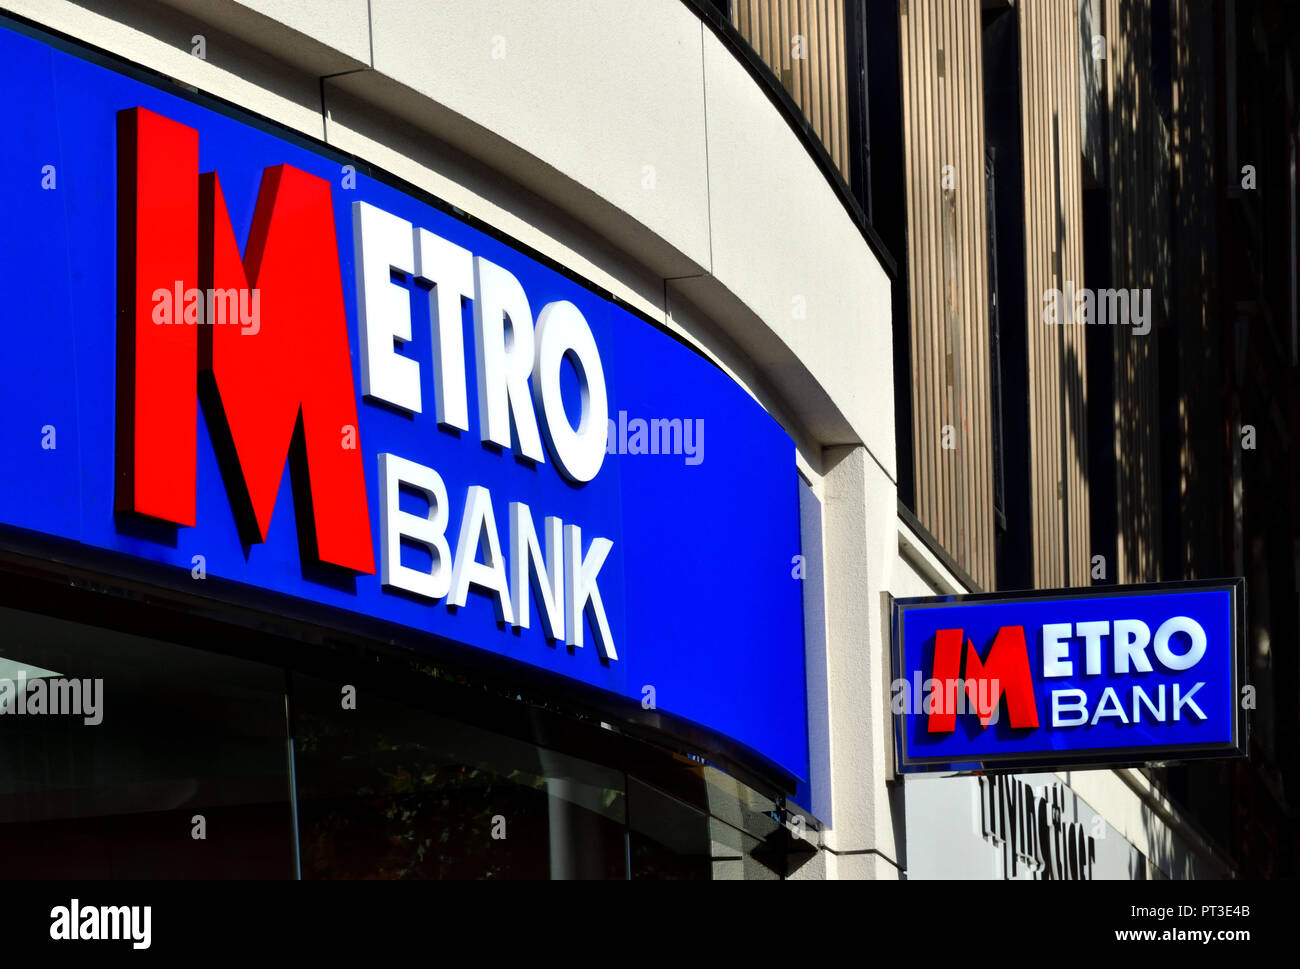 Metro Bank frontage, King's Road, London, England, UK. - Stock Image